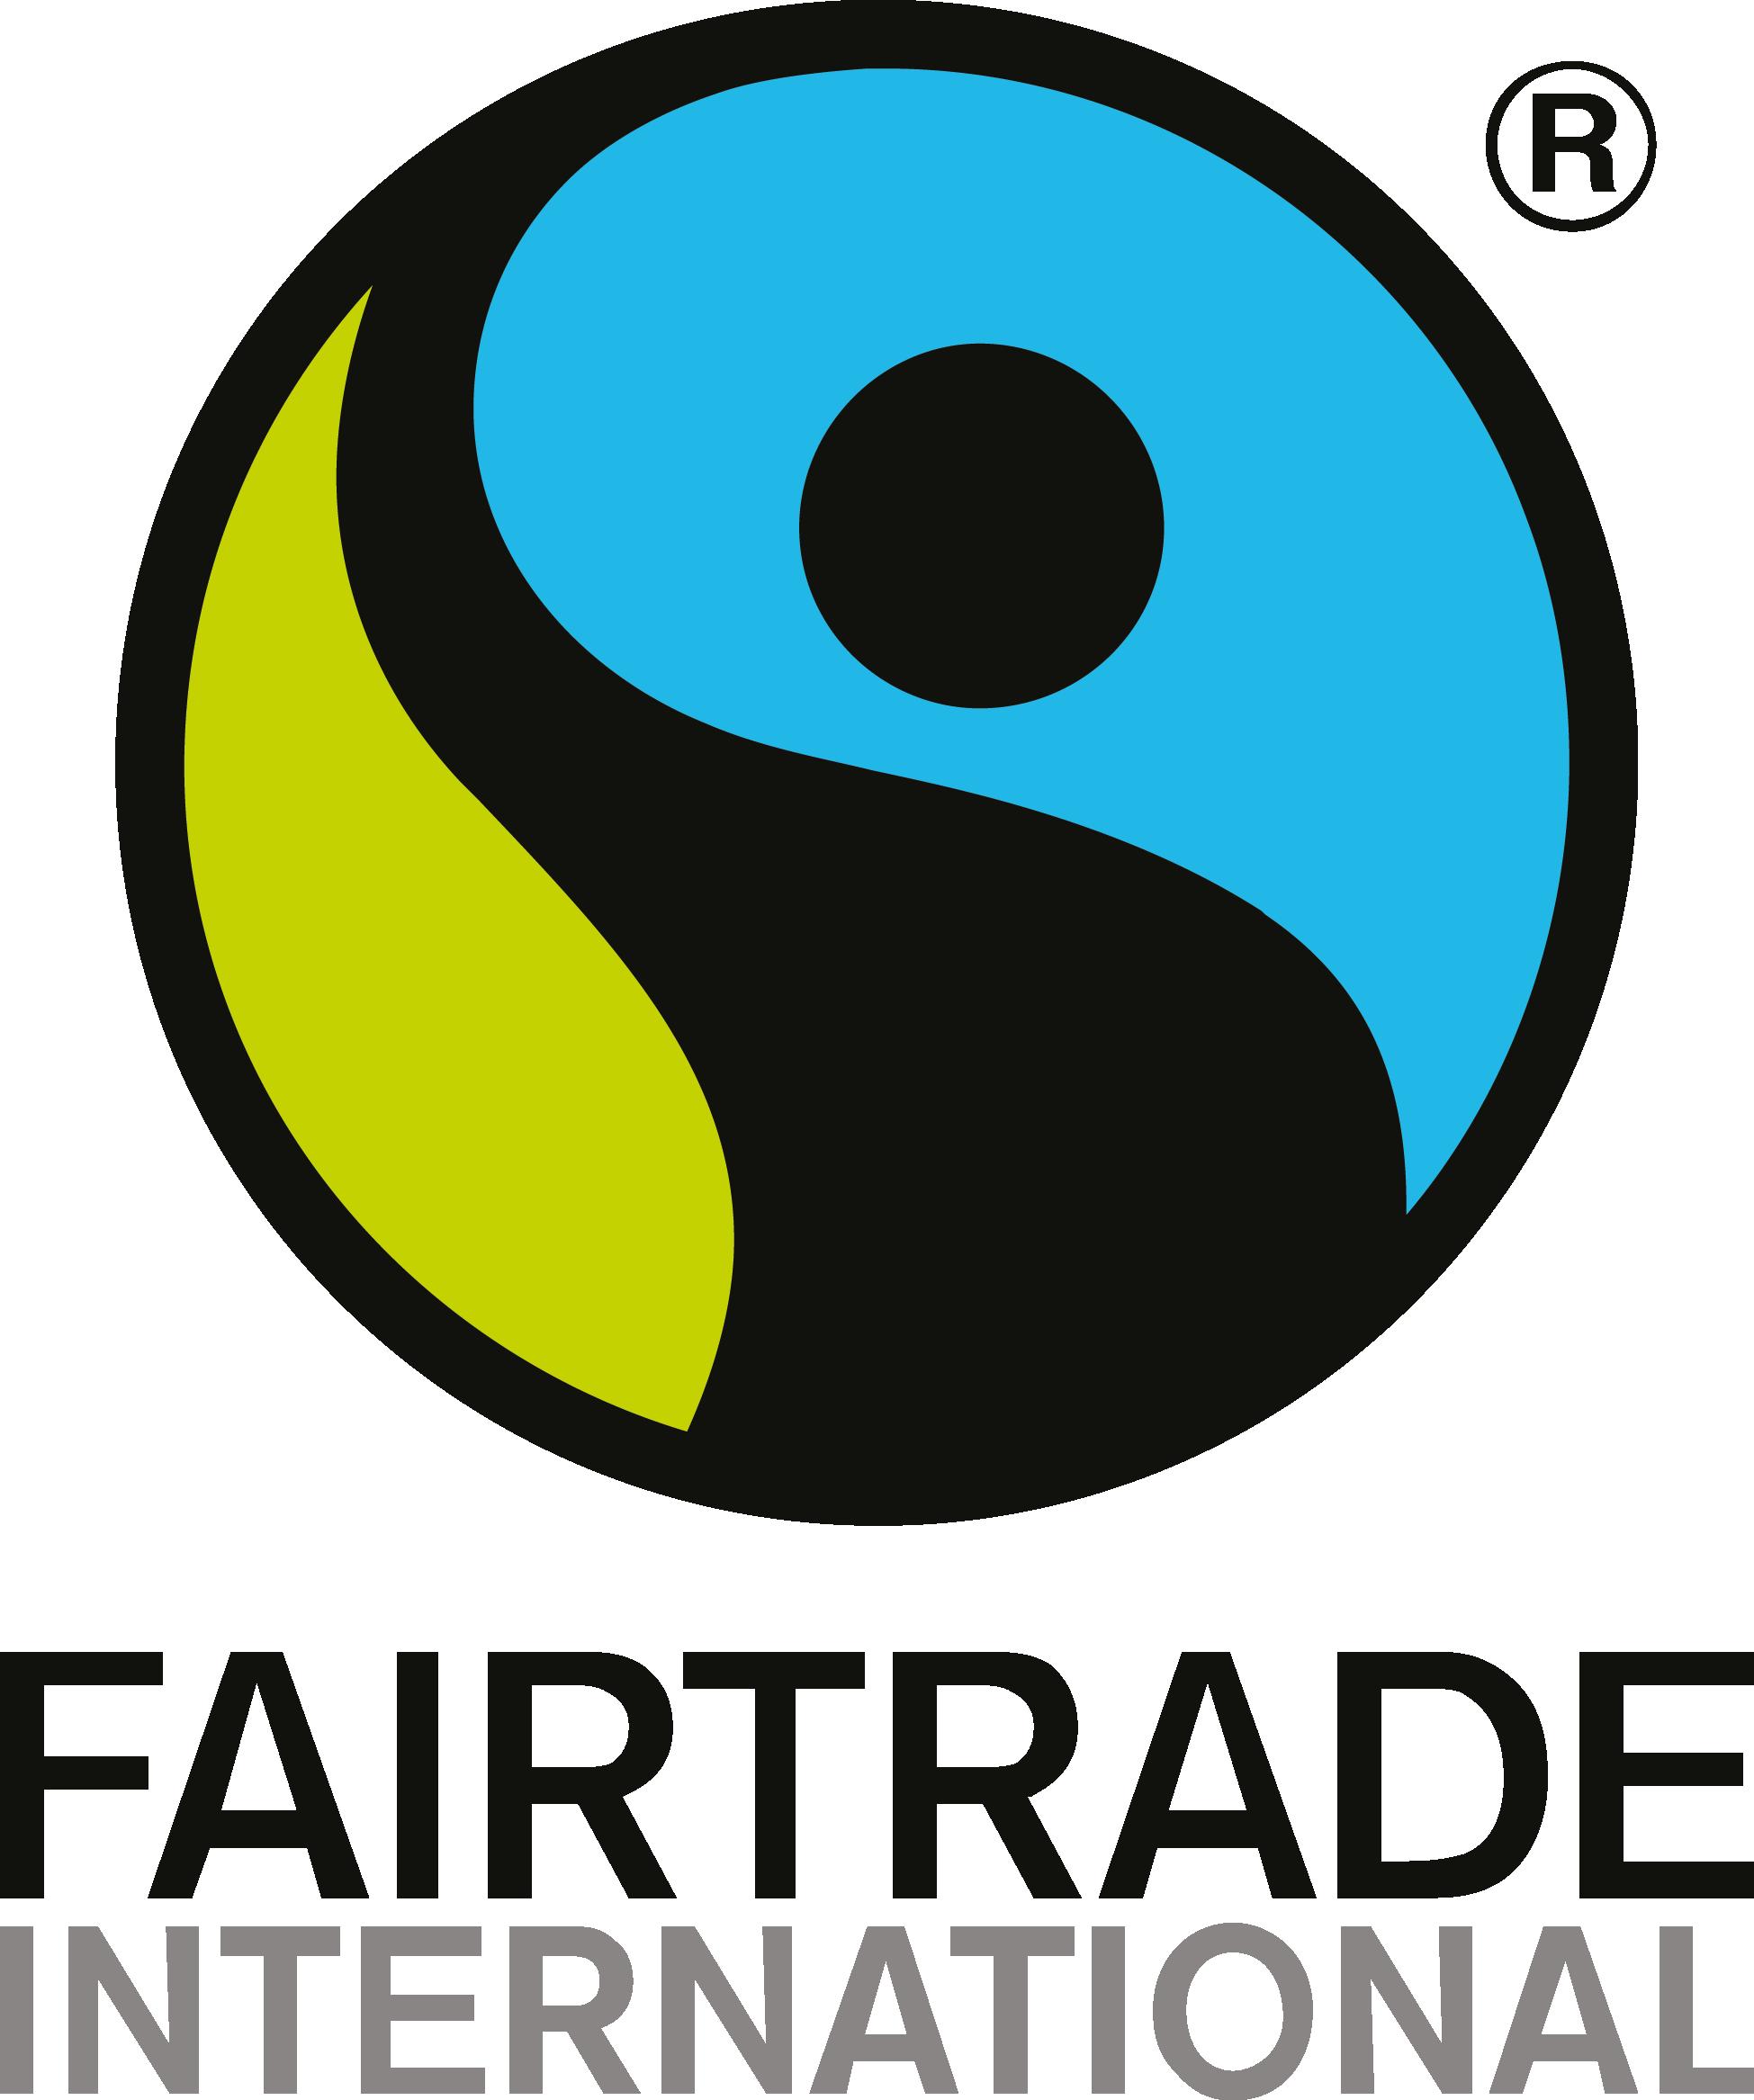 fairtrade-logo please add FLO ID -36646.png